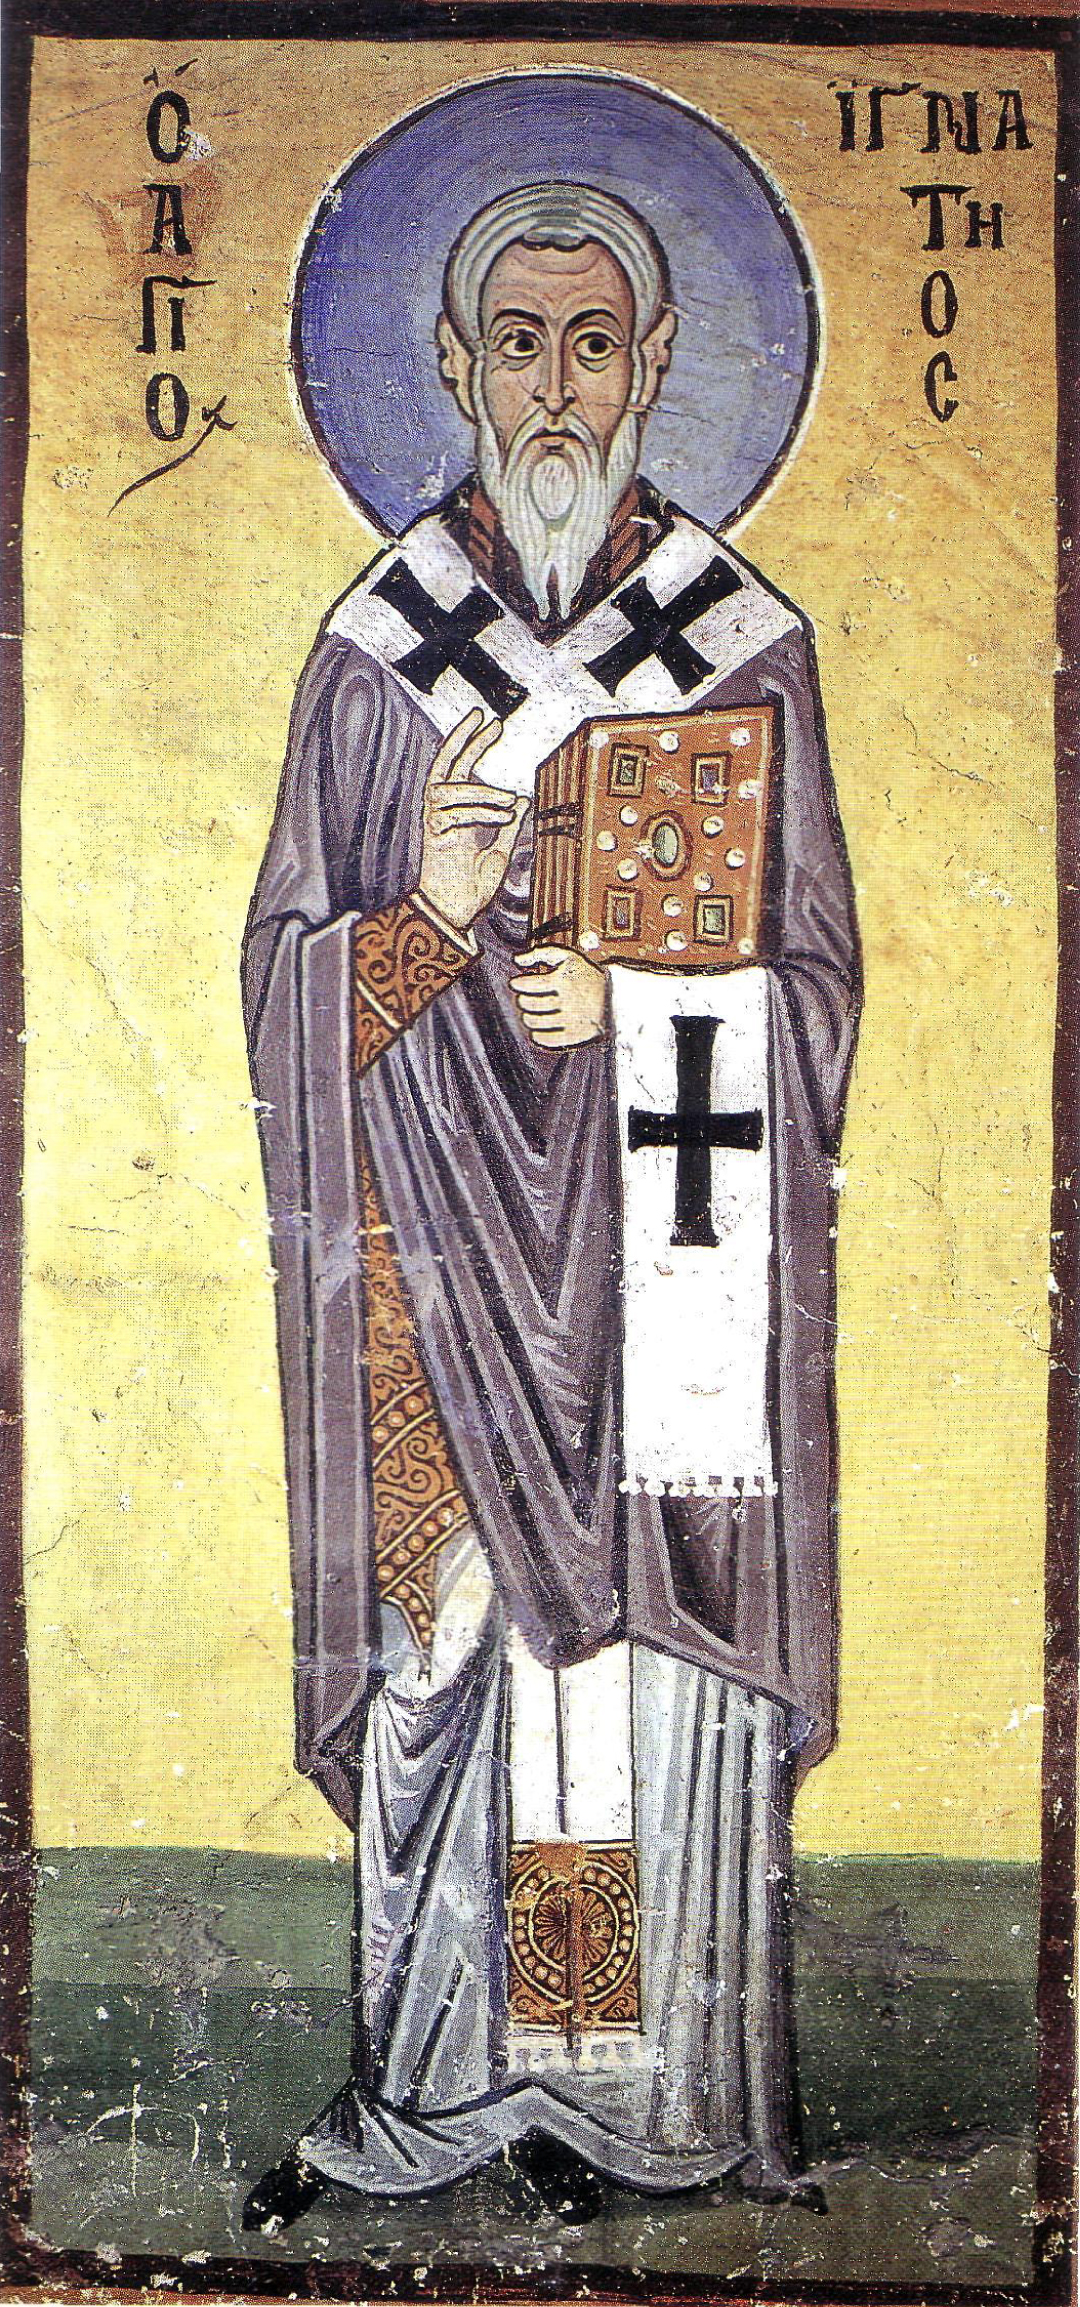 Saint Eugene - Roman martyr